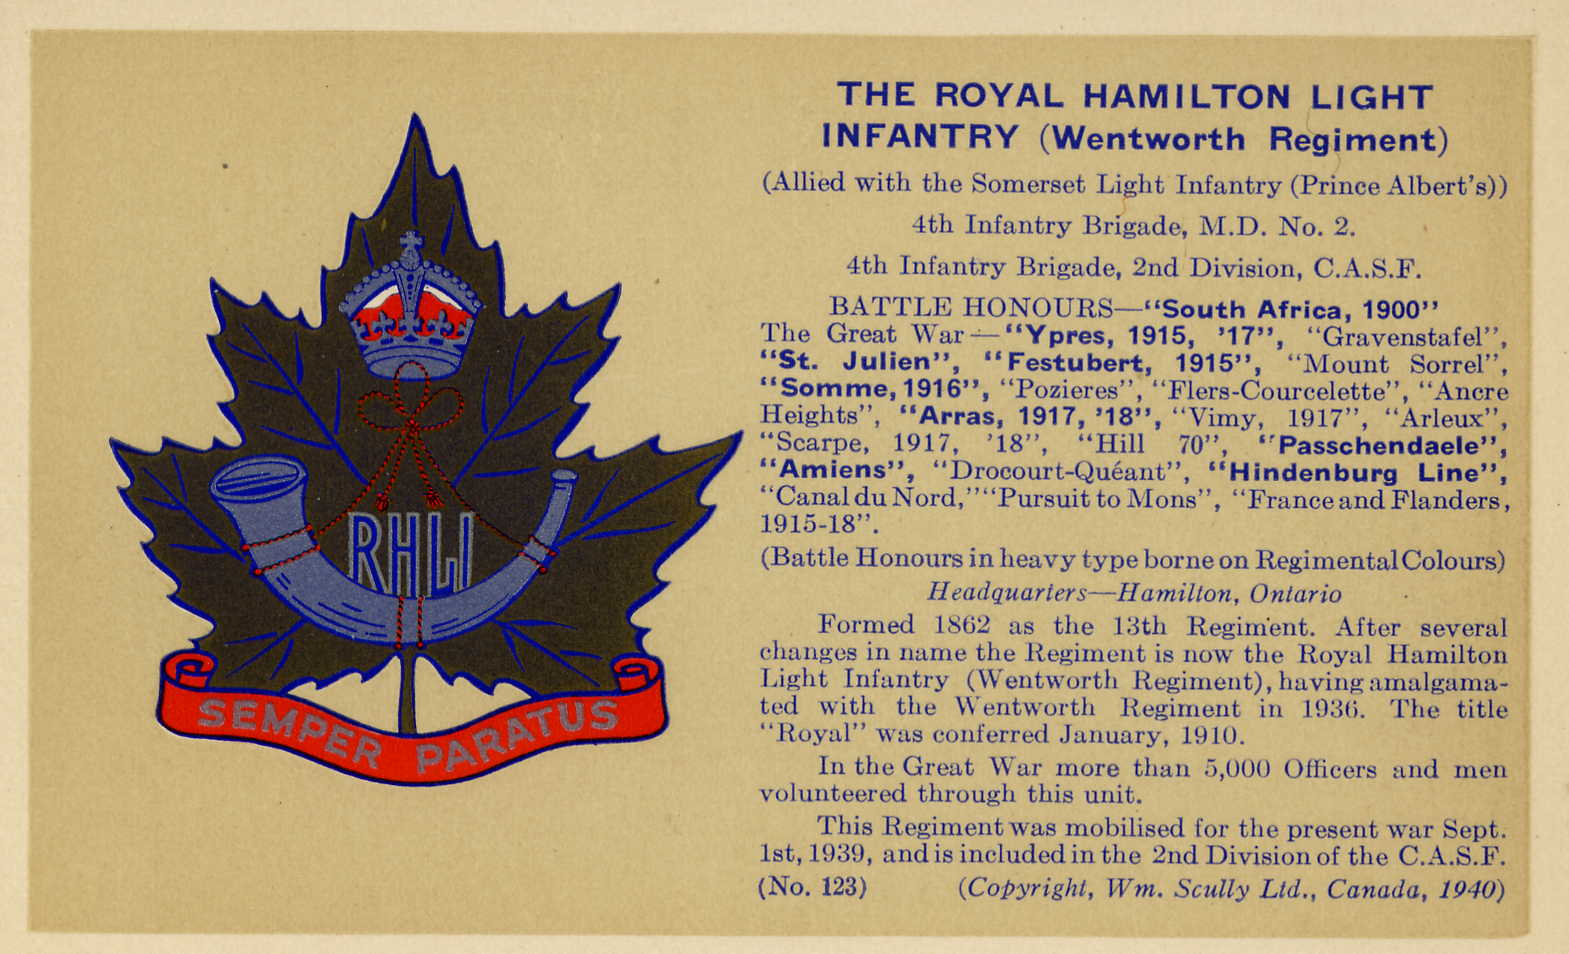 Royal Hamilton Light Infantry